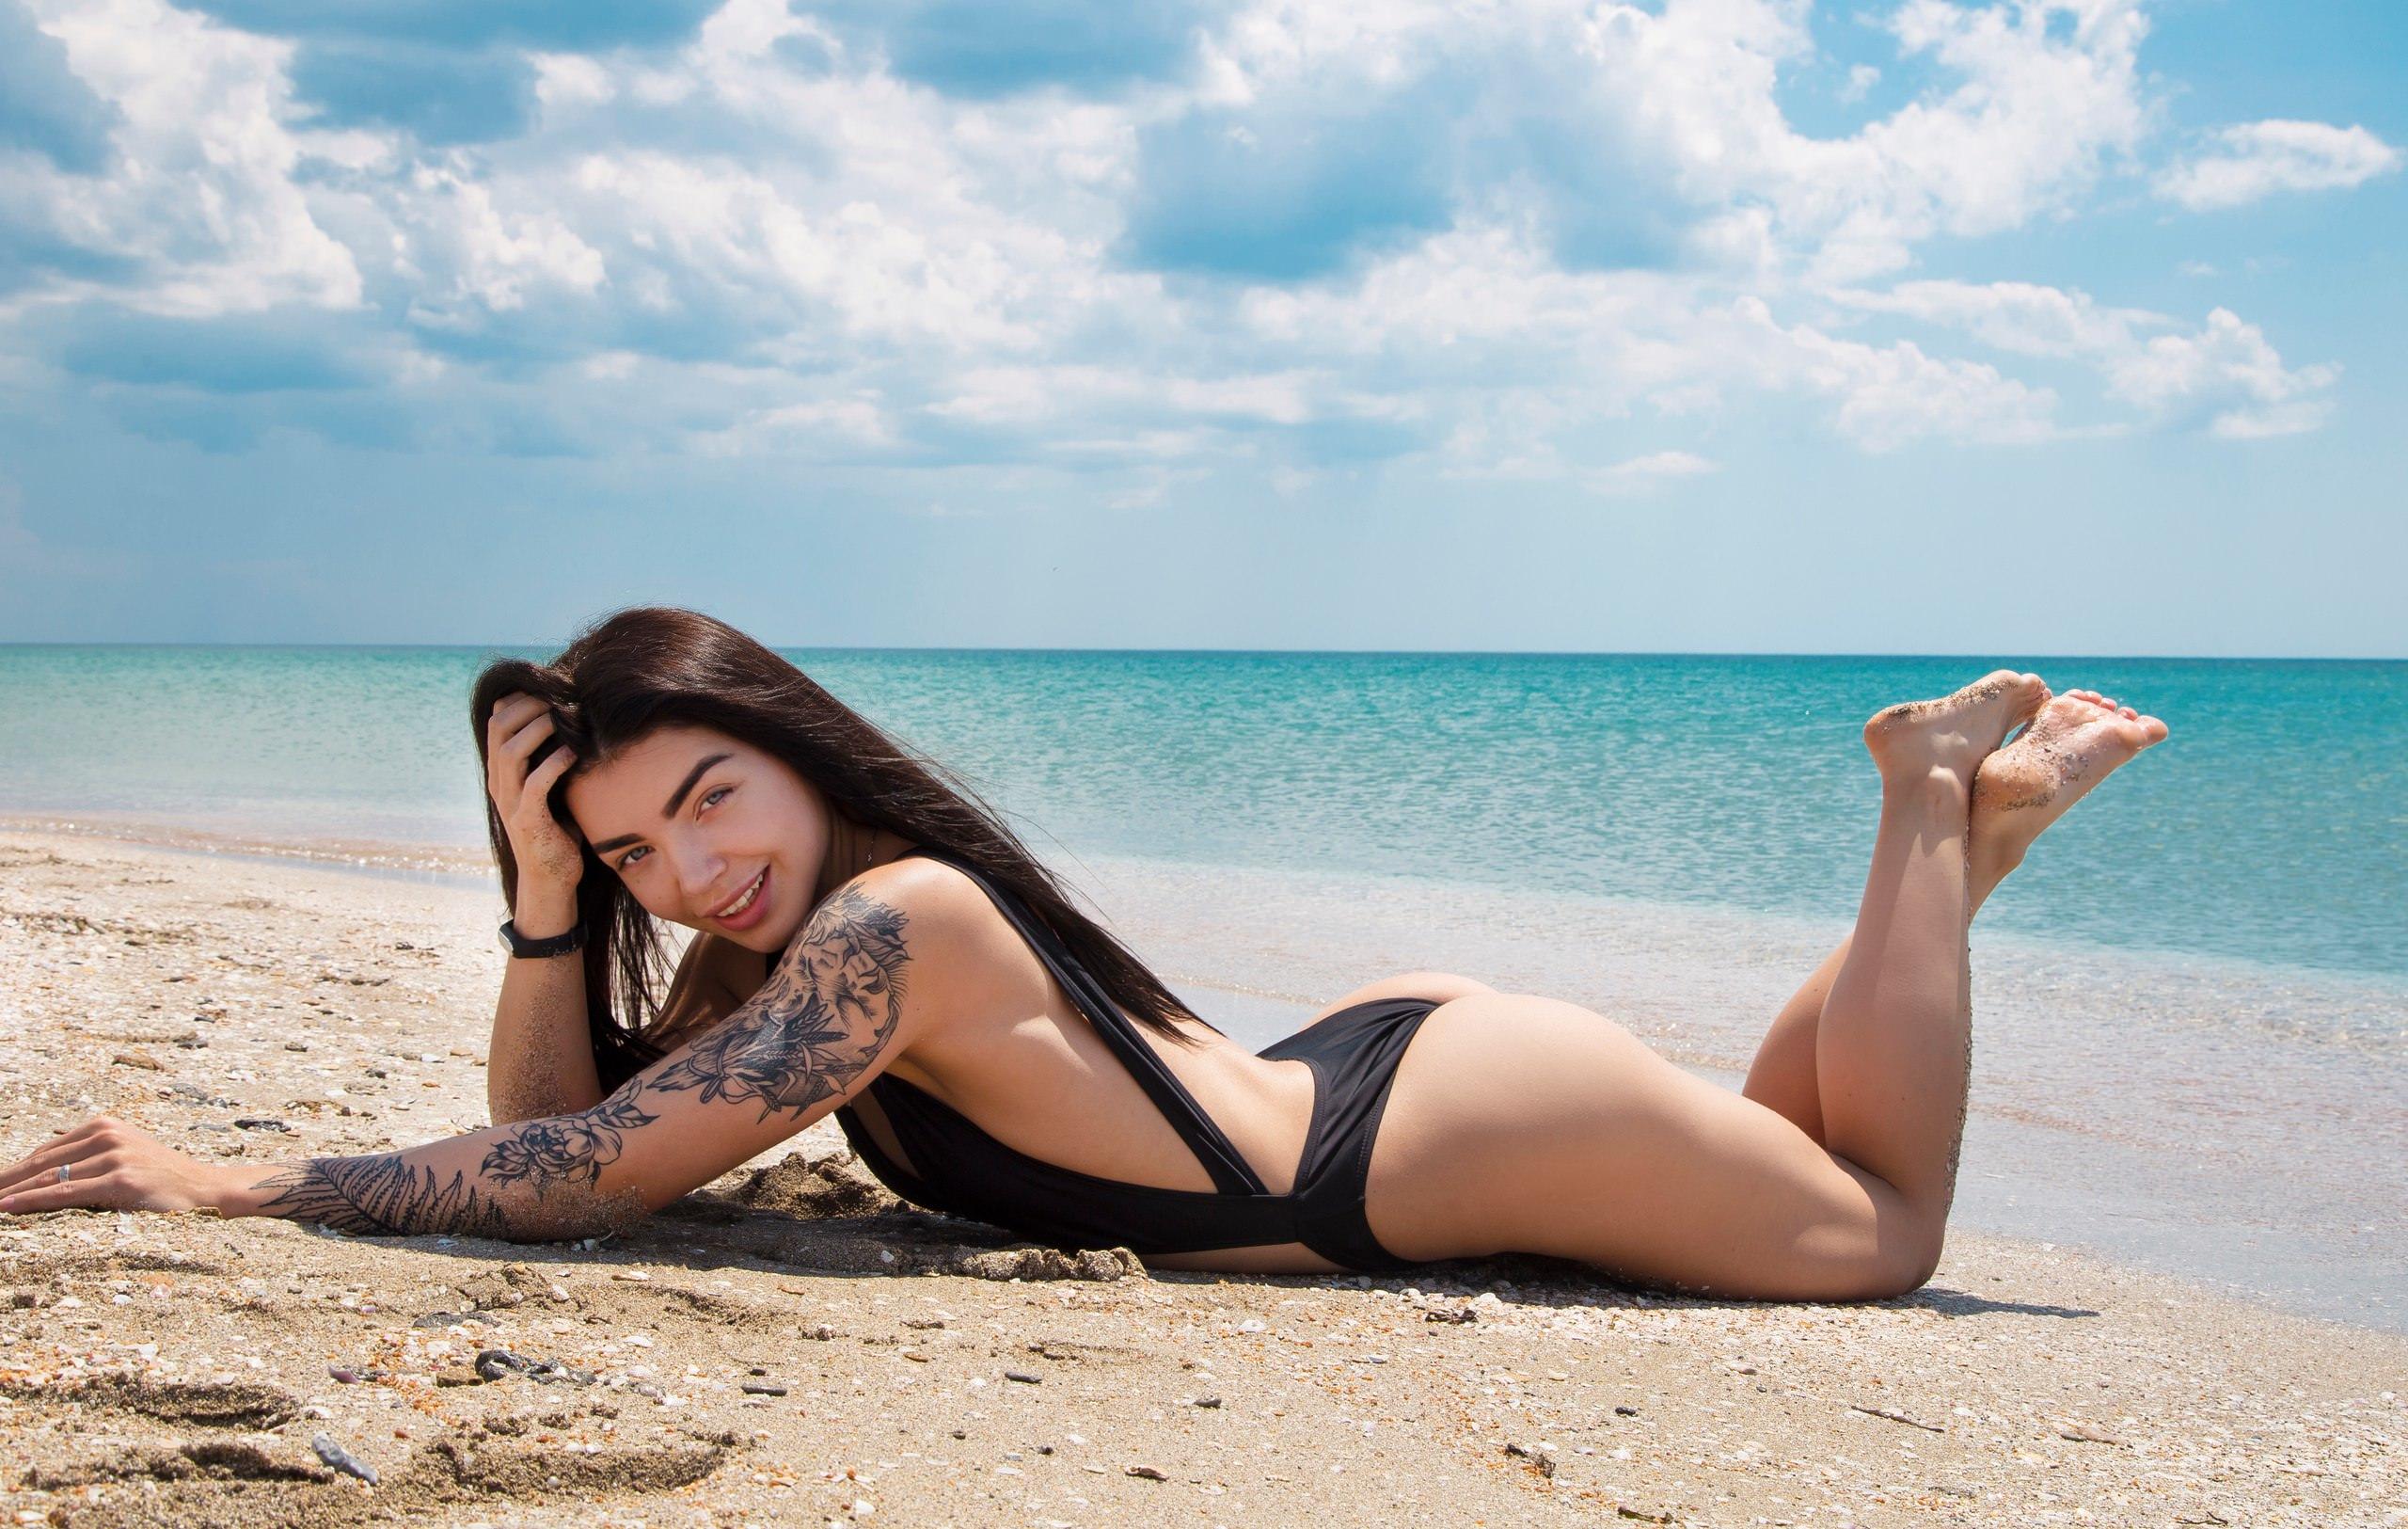 Фотографии брюнеток в на пляже